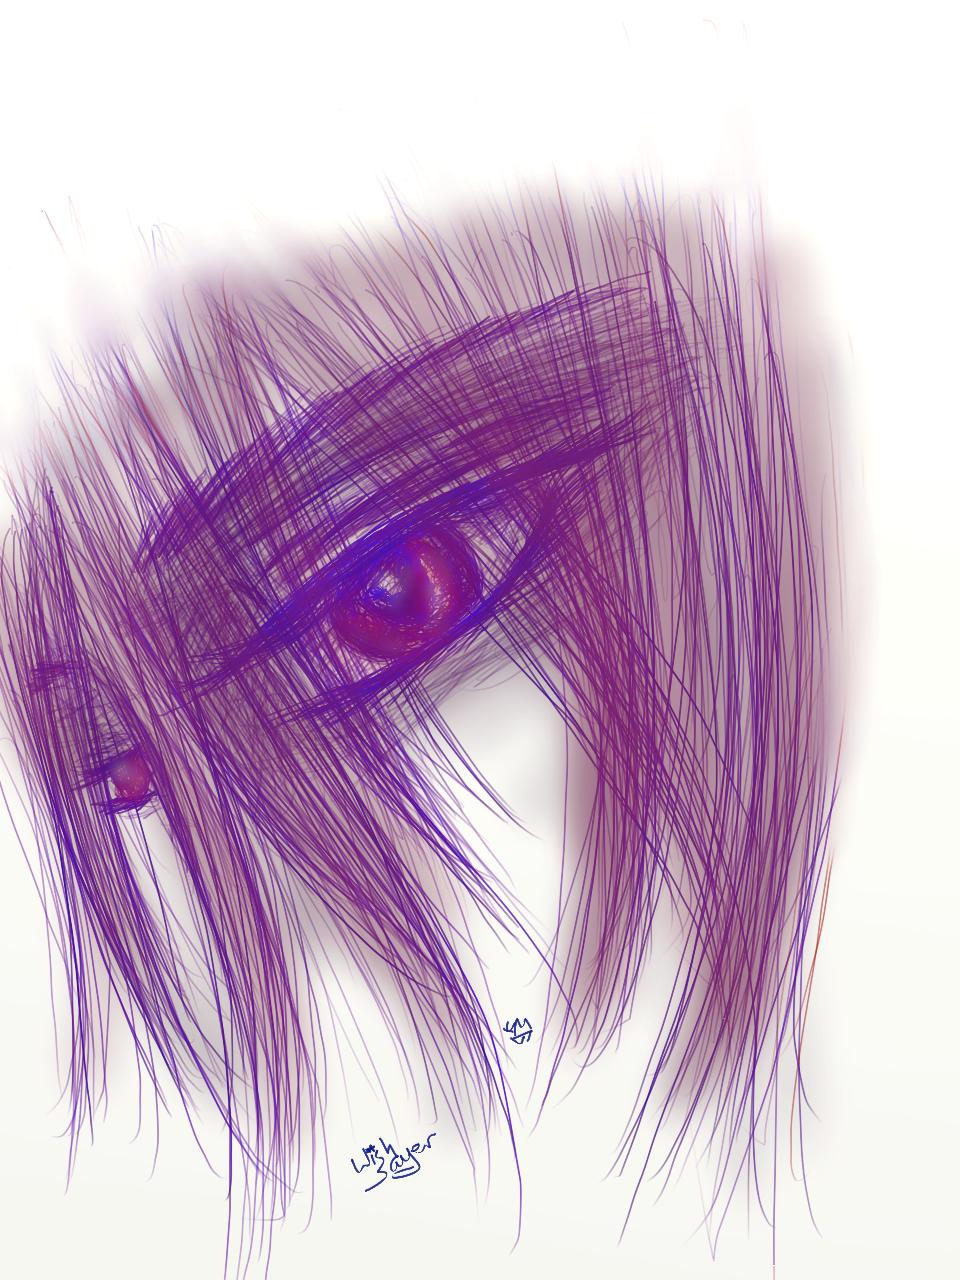 eye sketch by Wishsayer